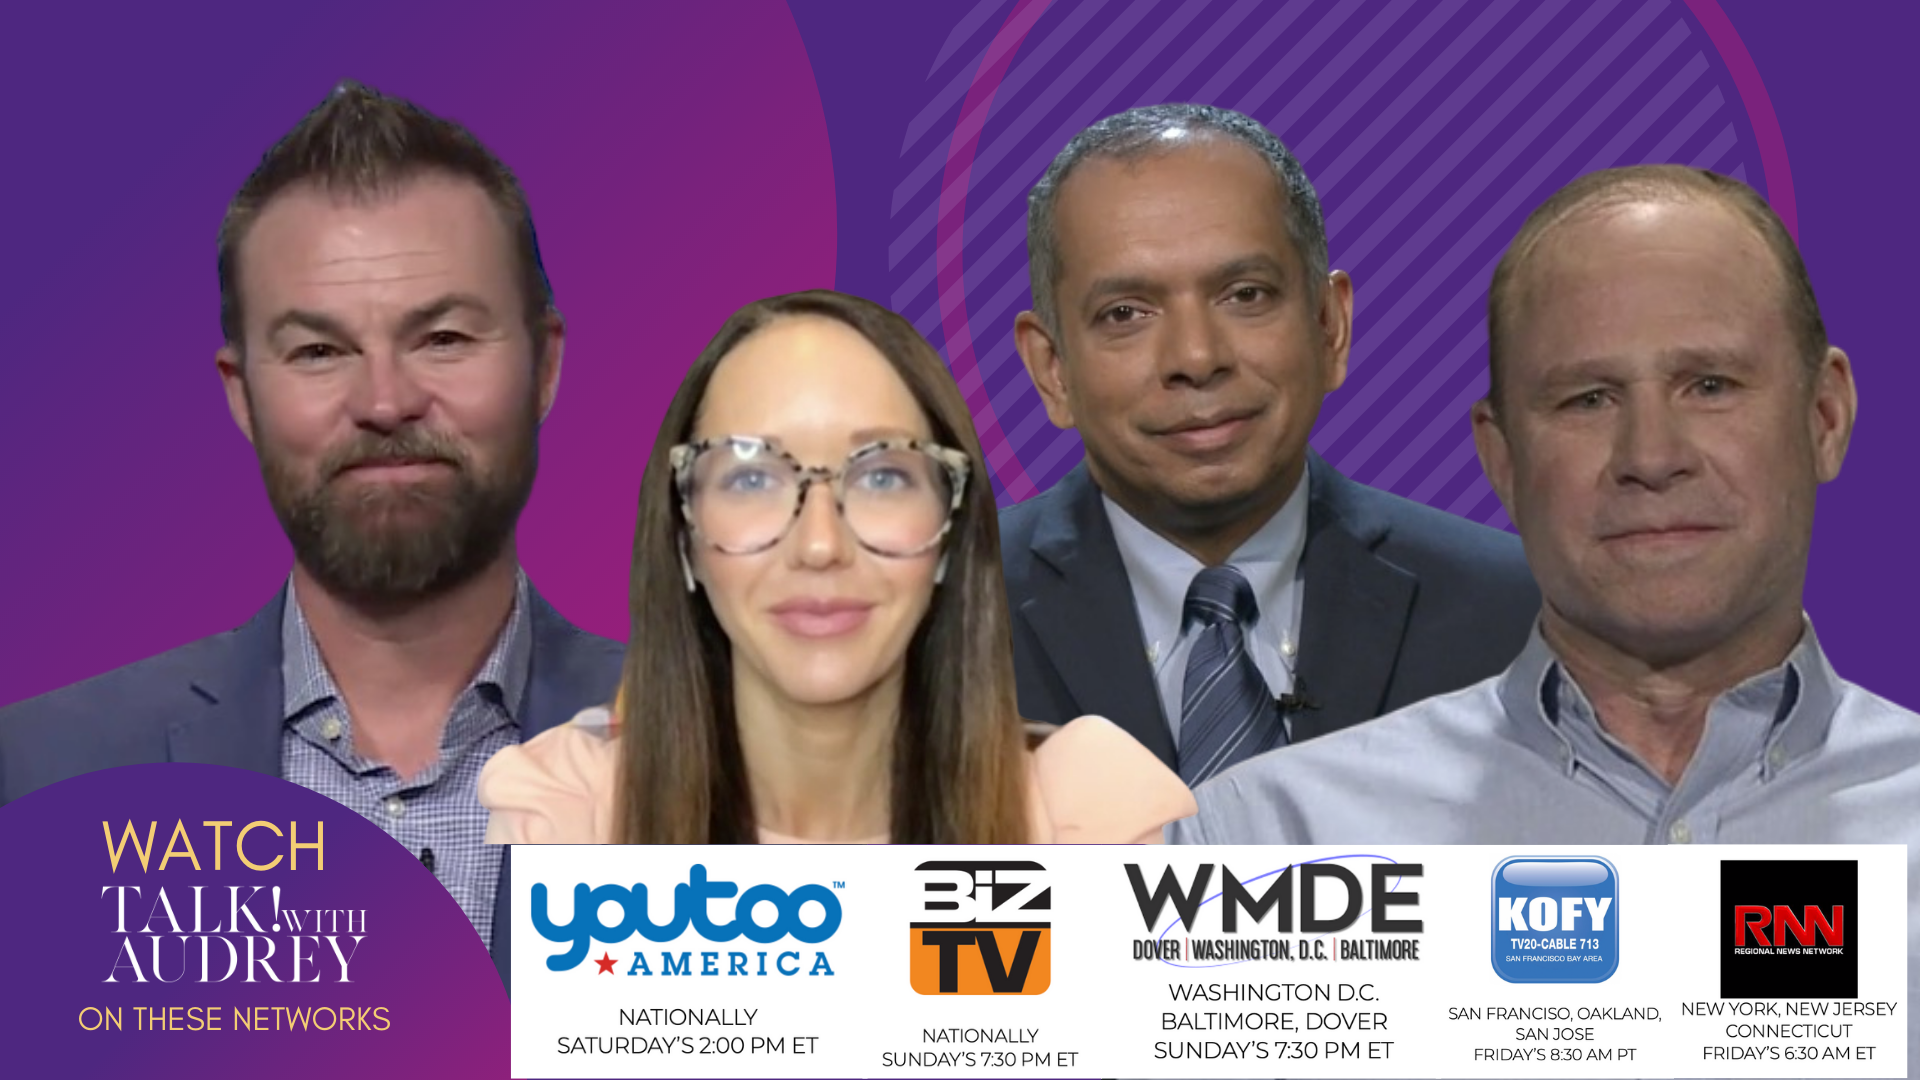 April 17-20, 2020 – TALK! with AUDREY TV